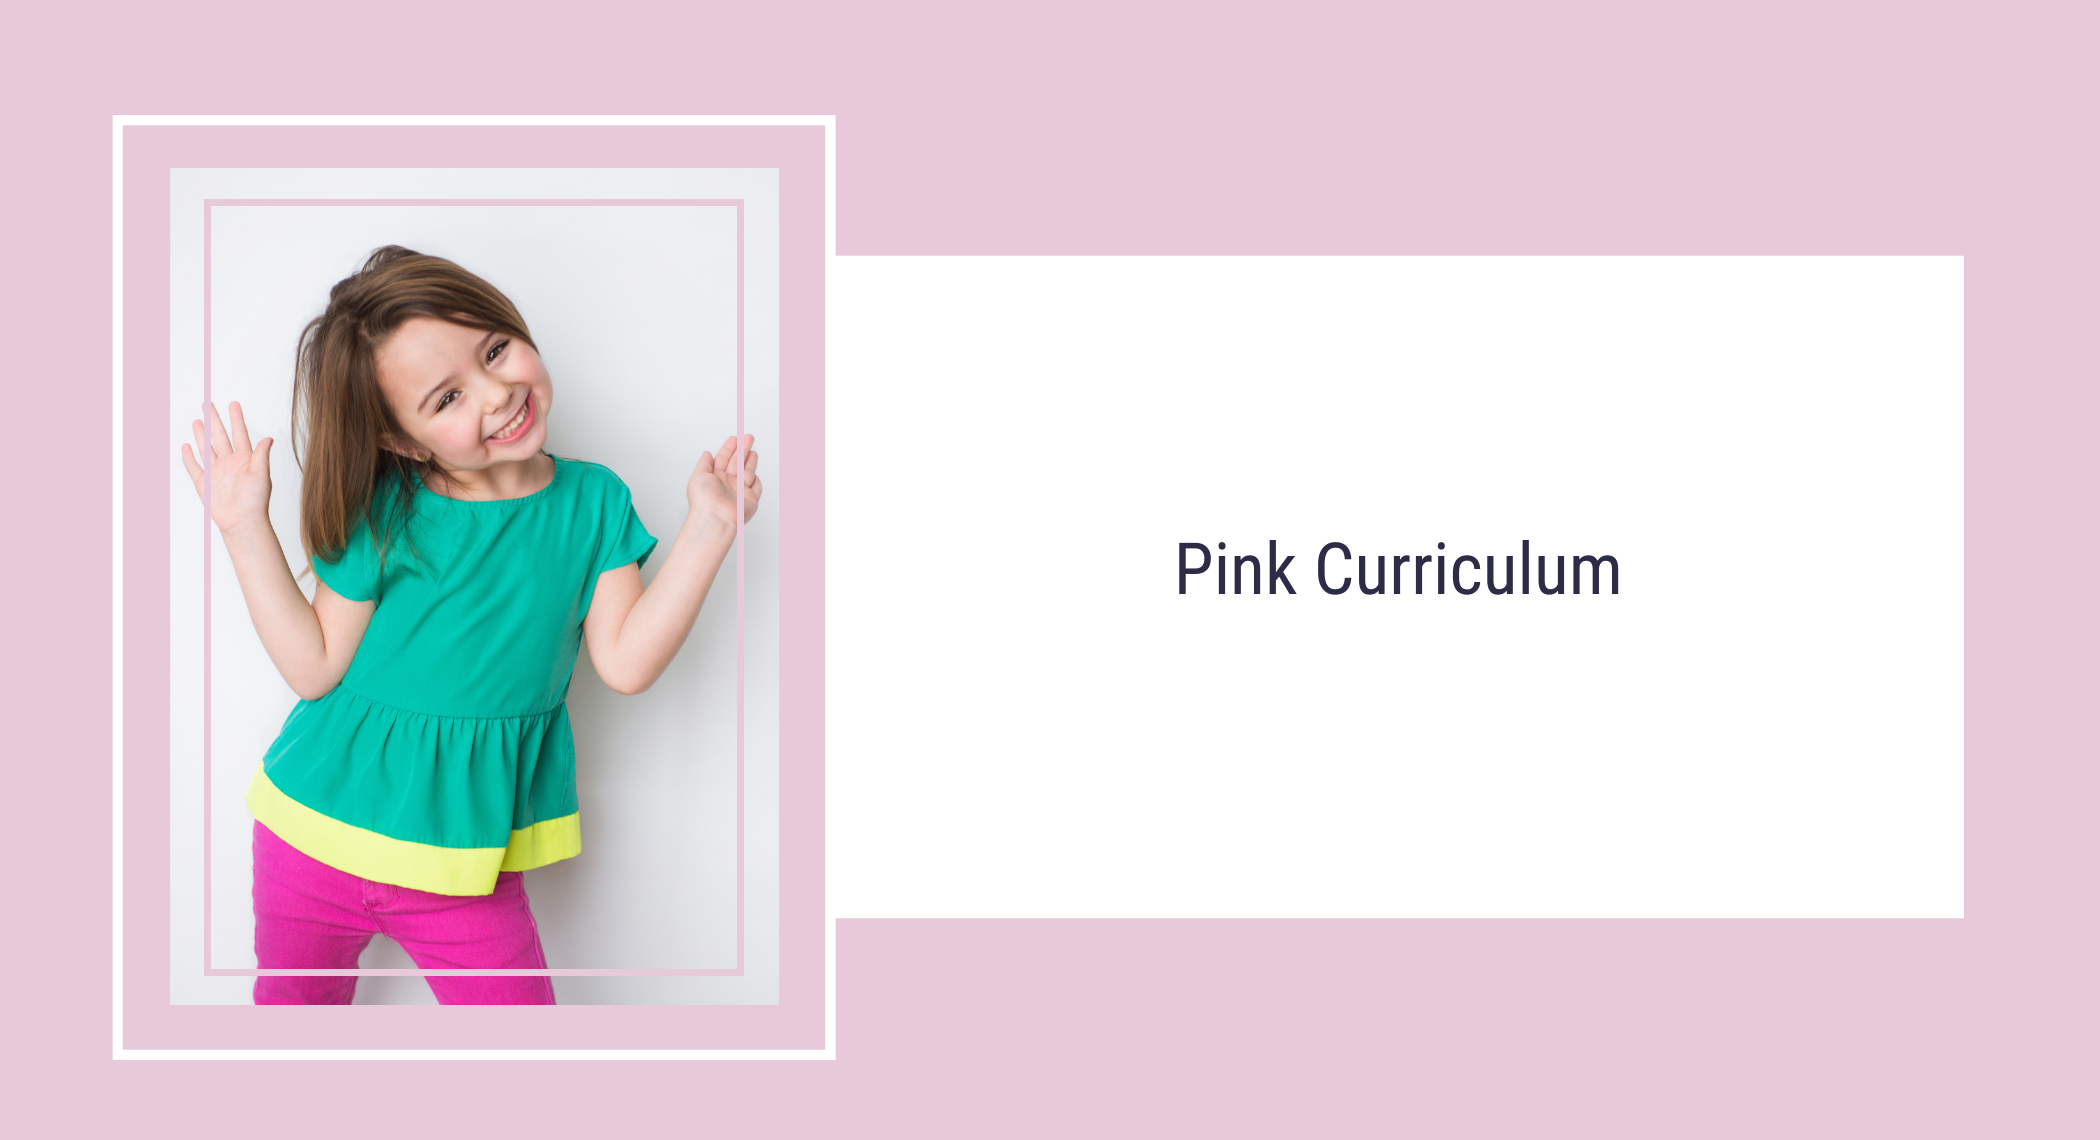 Pink Curriculum